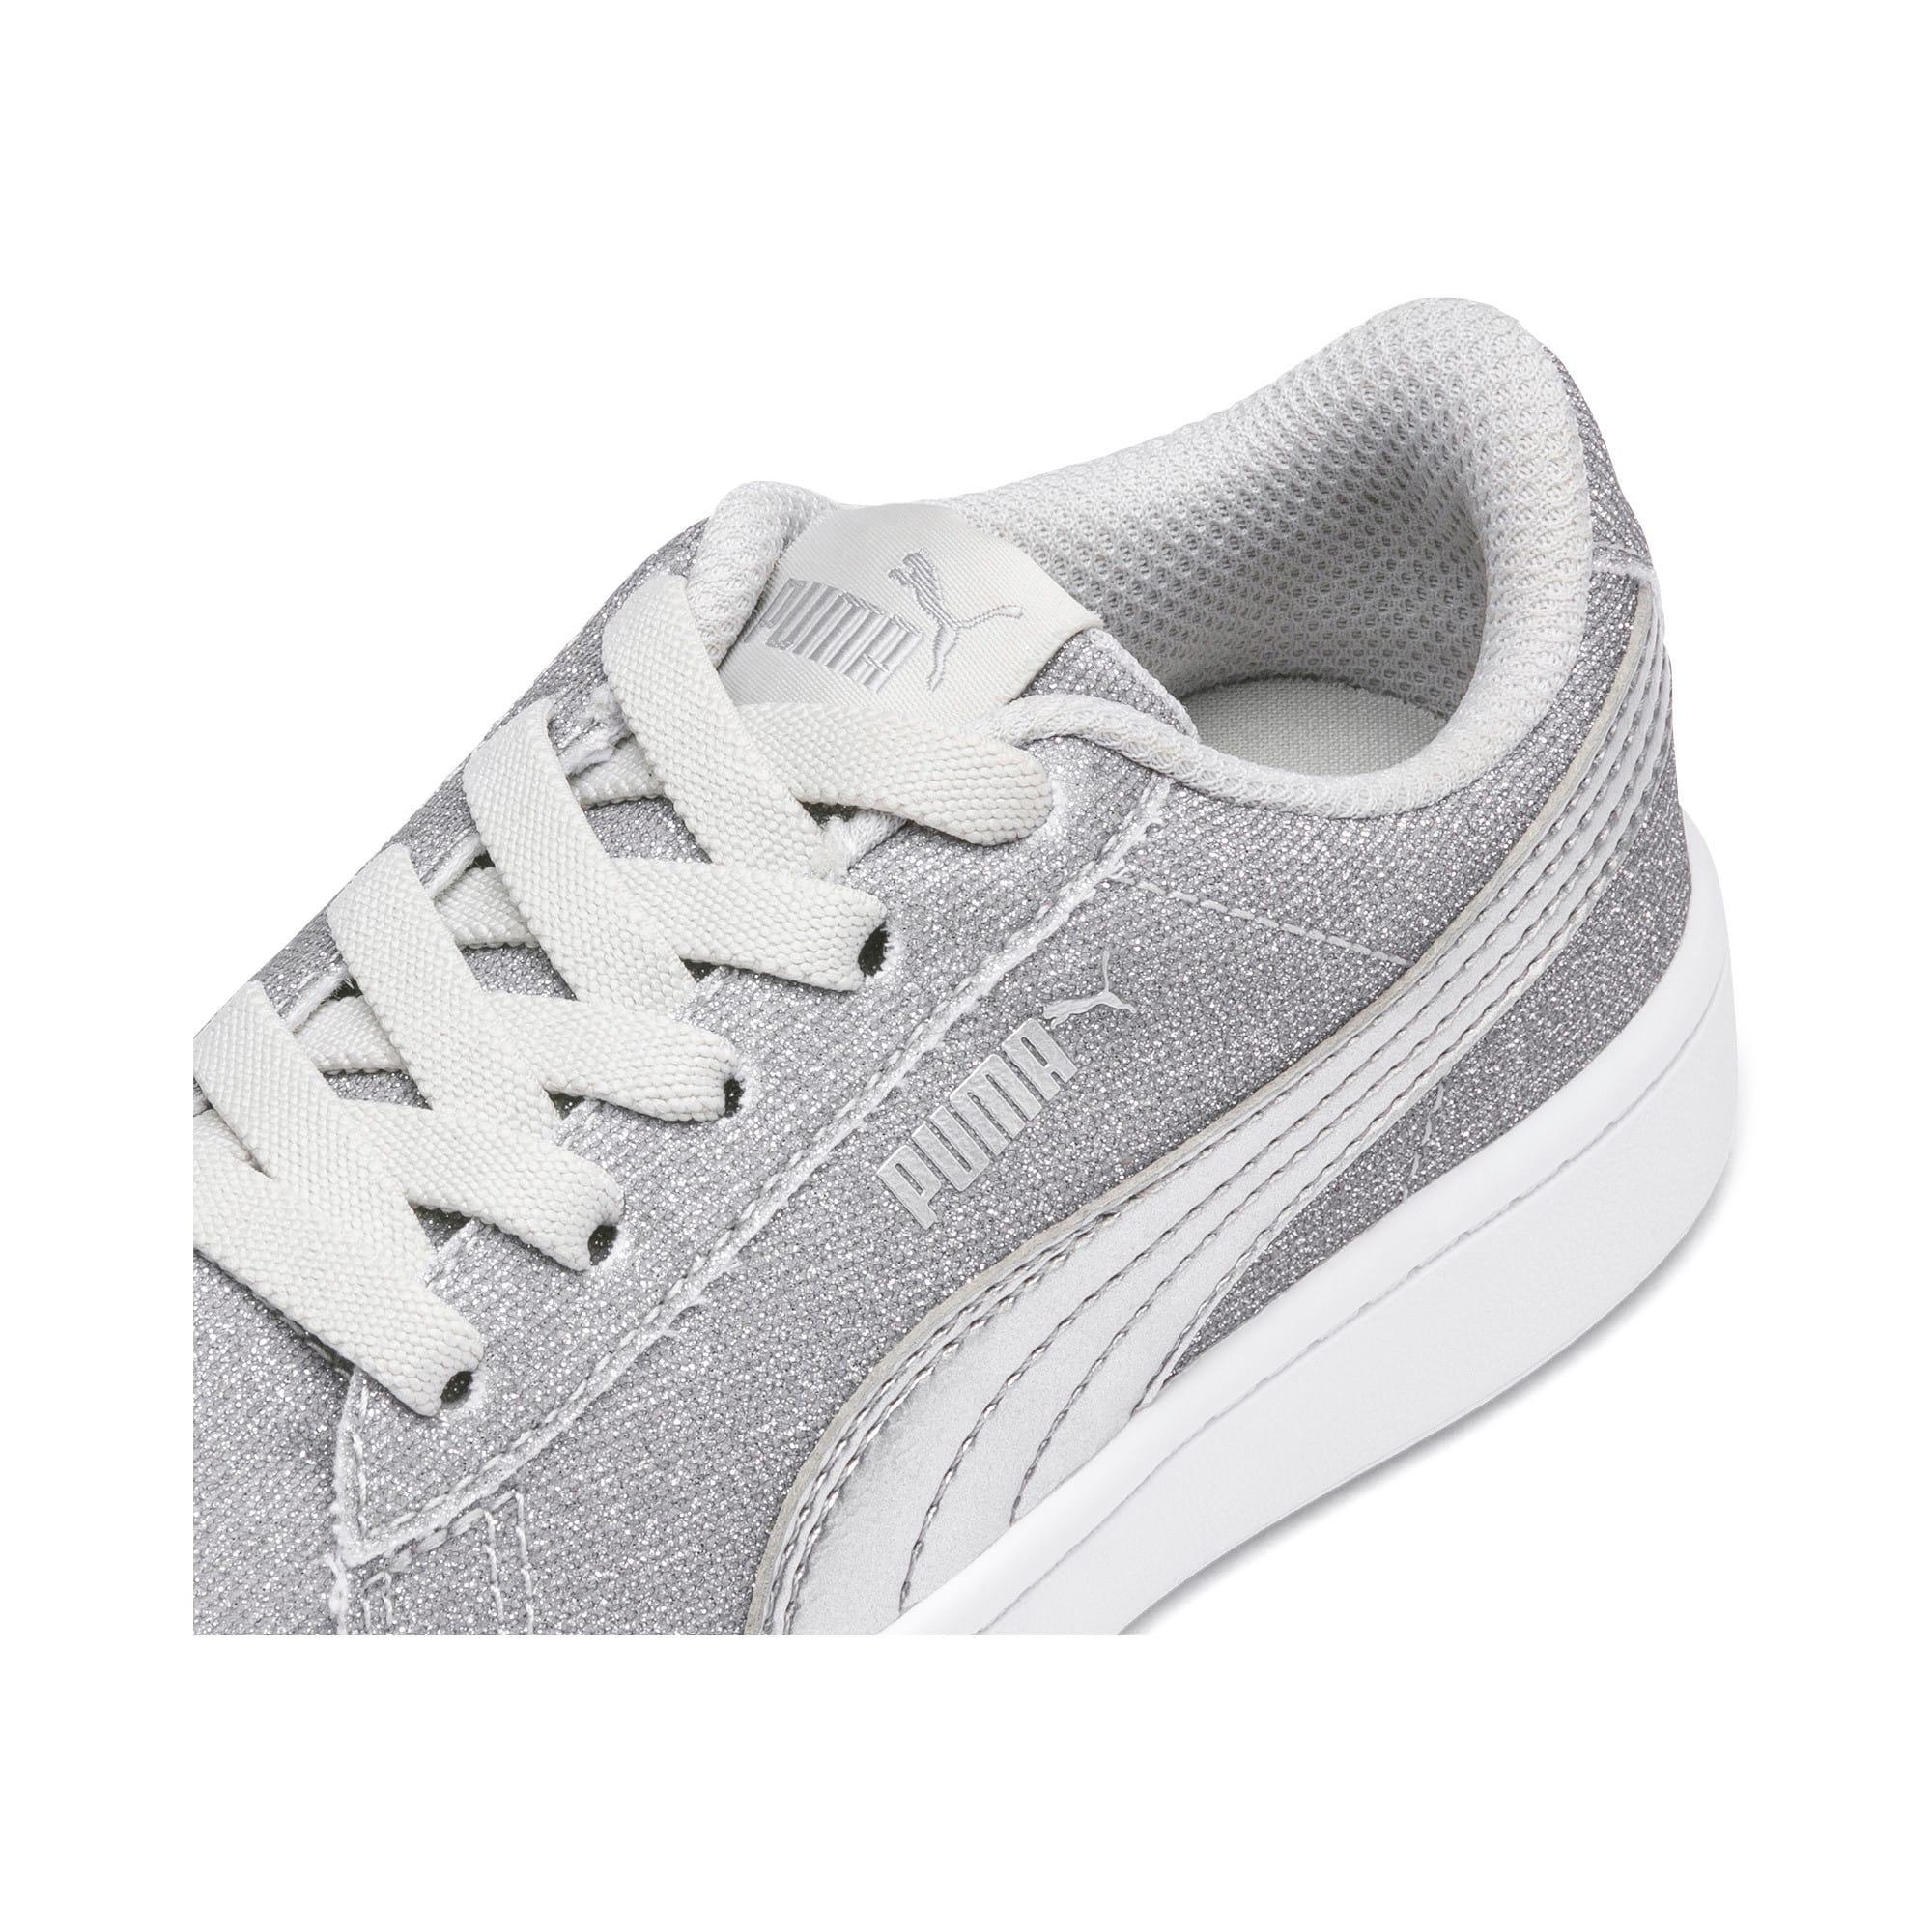 Thumbnail 7 of PUMA Vikky v2 Glitz AC Sneakers PS, Gray Violet-Silver-White, medium